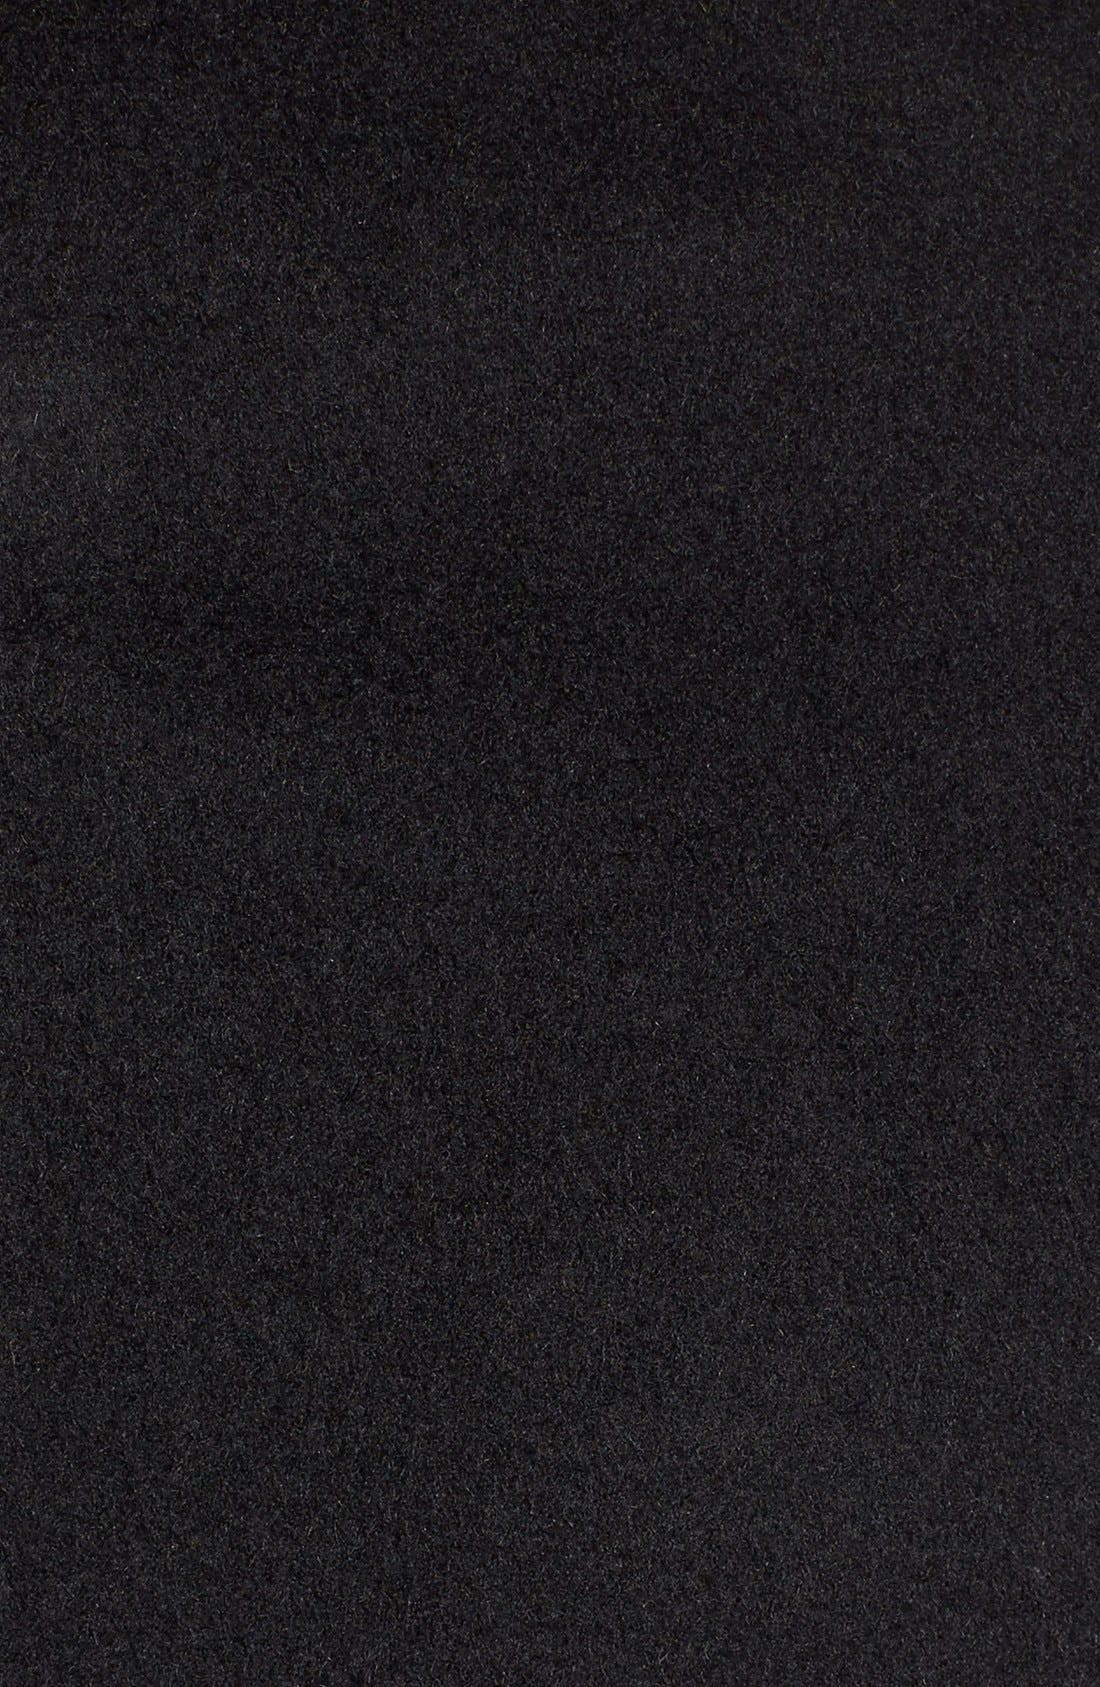 Single Breasted Wool Blend Coat,                             Alternate thumbnail 2, color,                             BLACK